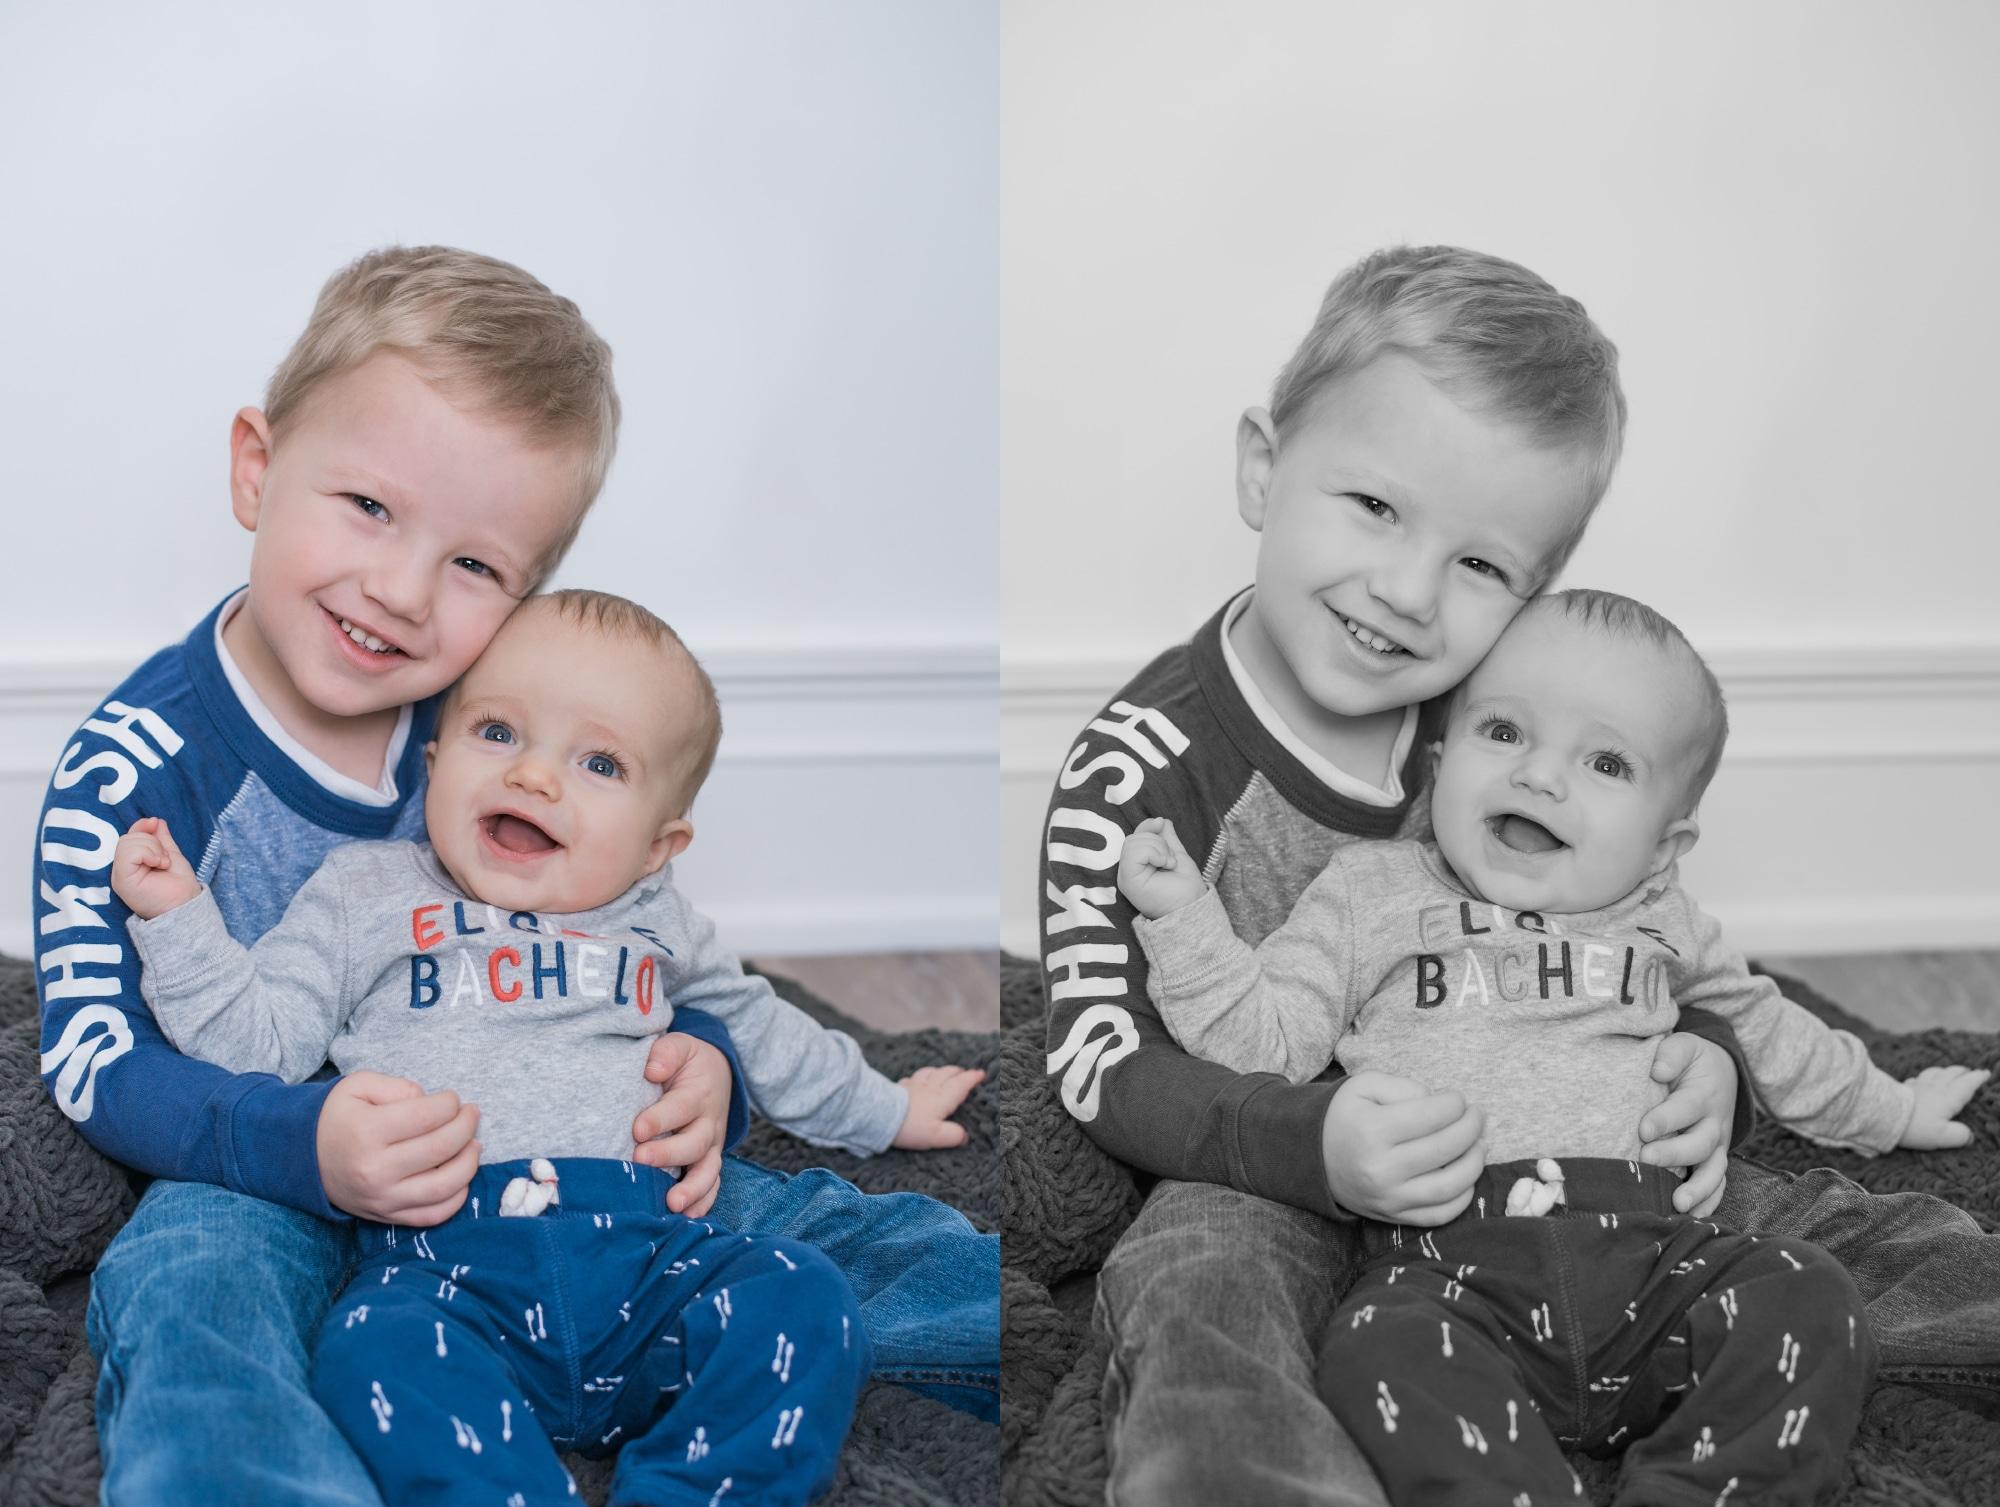 Lafayette Indiana Photographer | Lafayette IN Photographers | Brother Photos | Family Photos | Luminant Photography | Second Level Studios | Victoria Rayburn